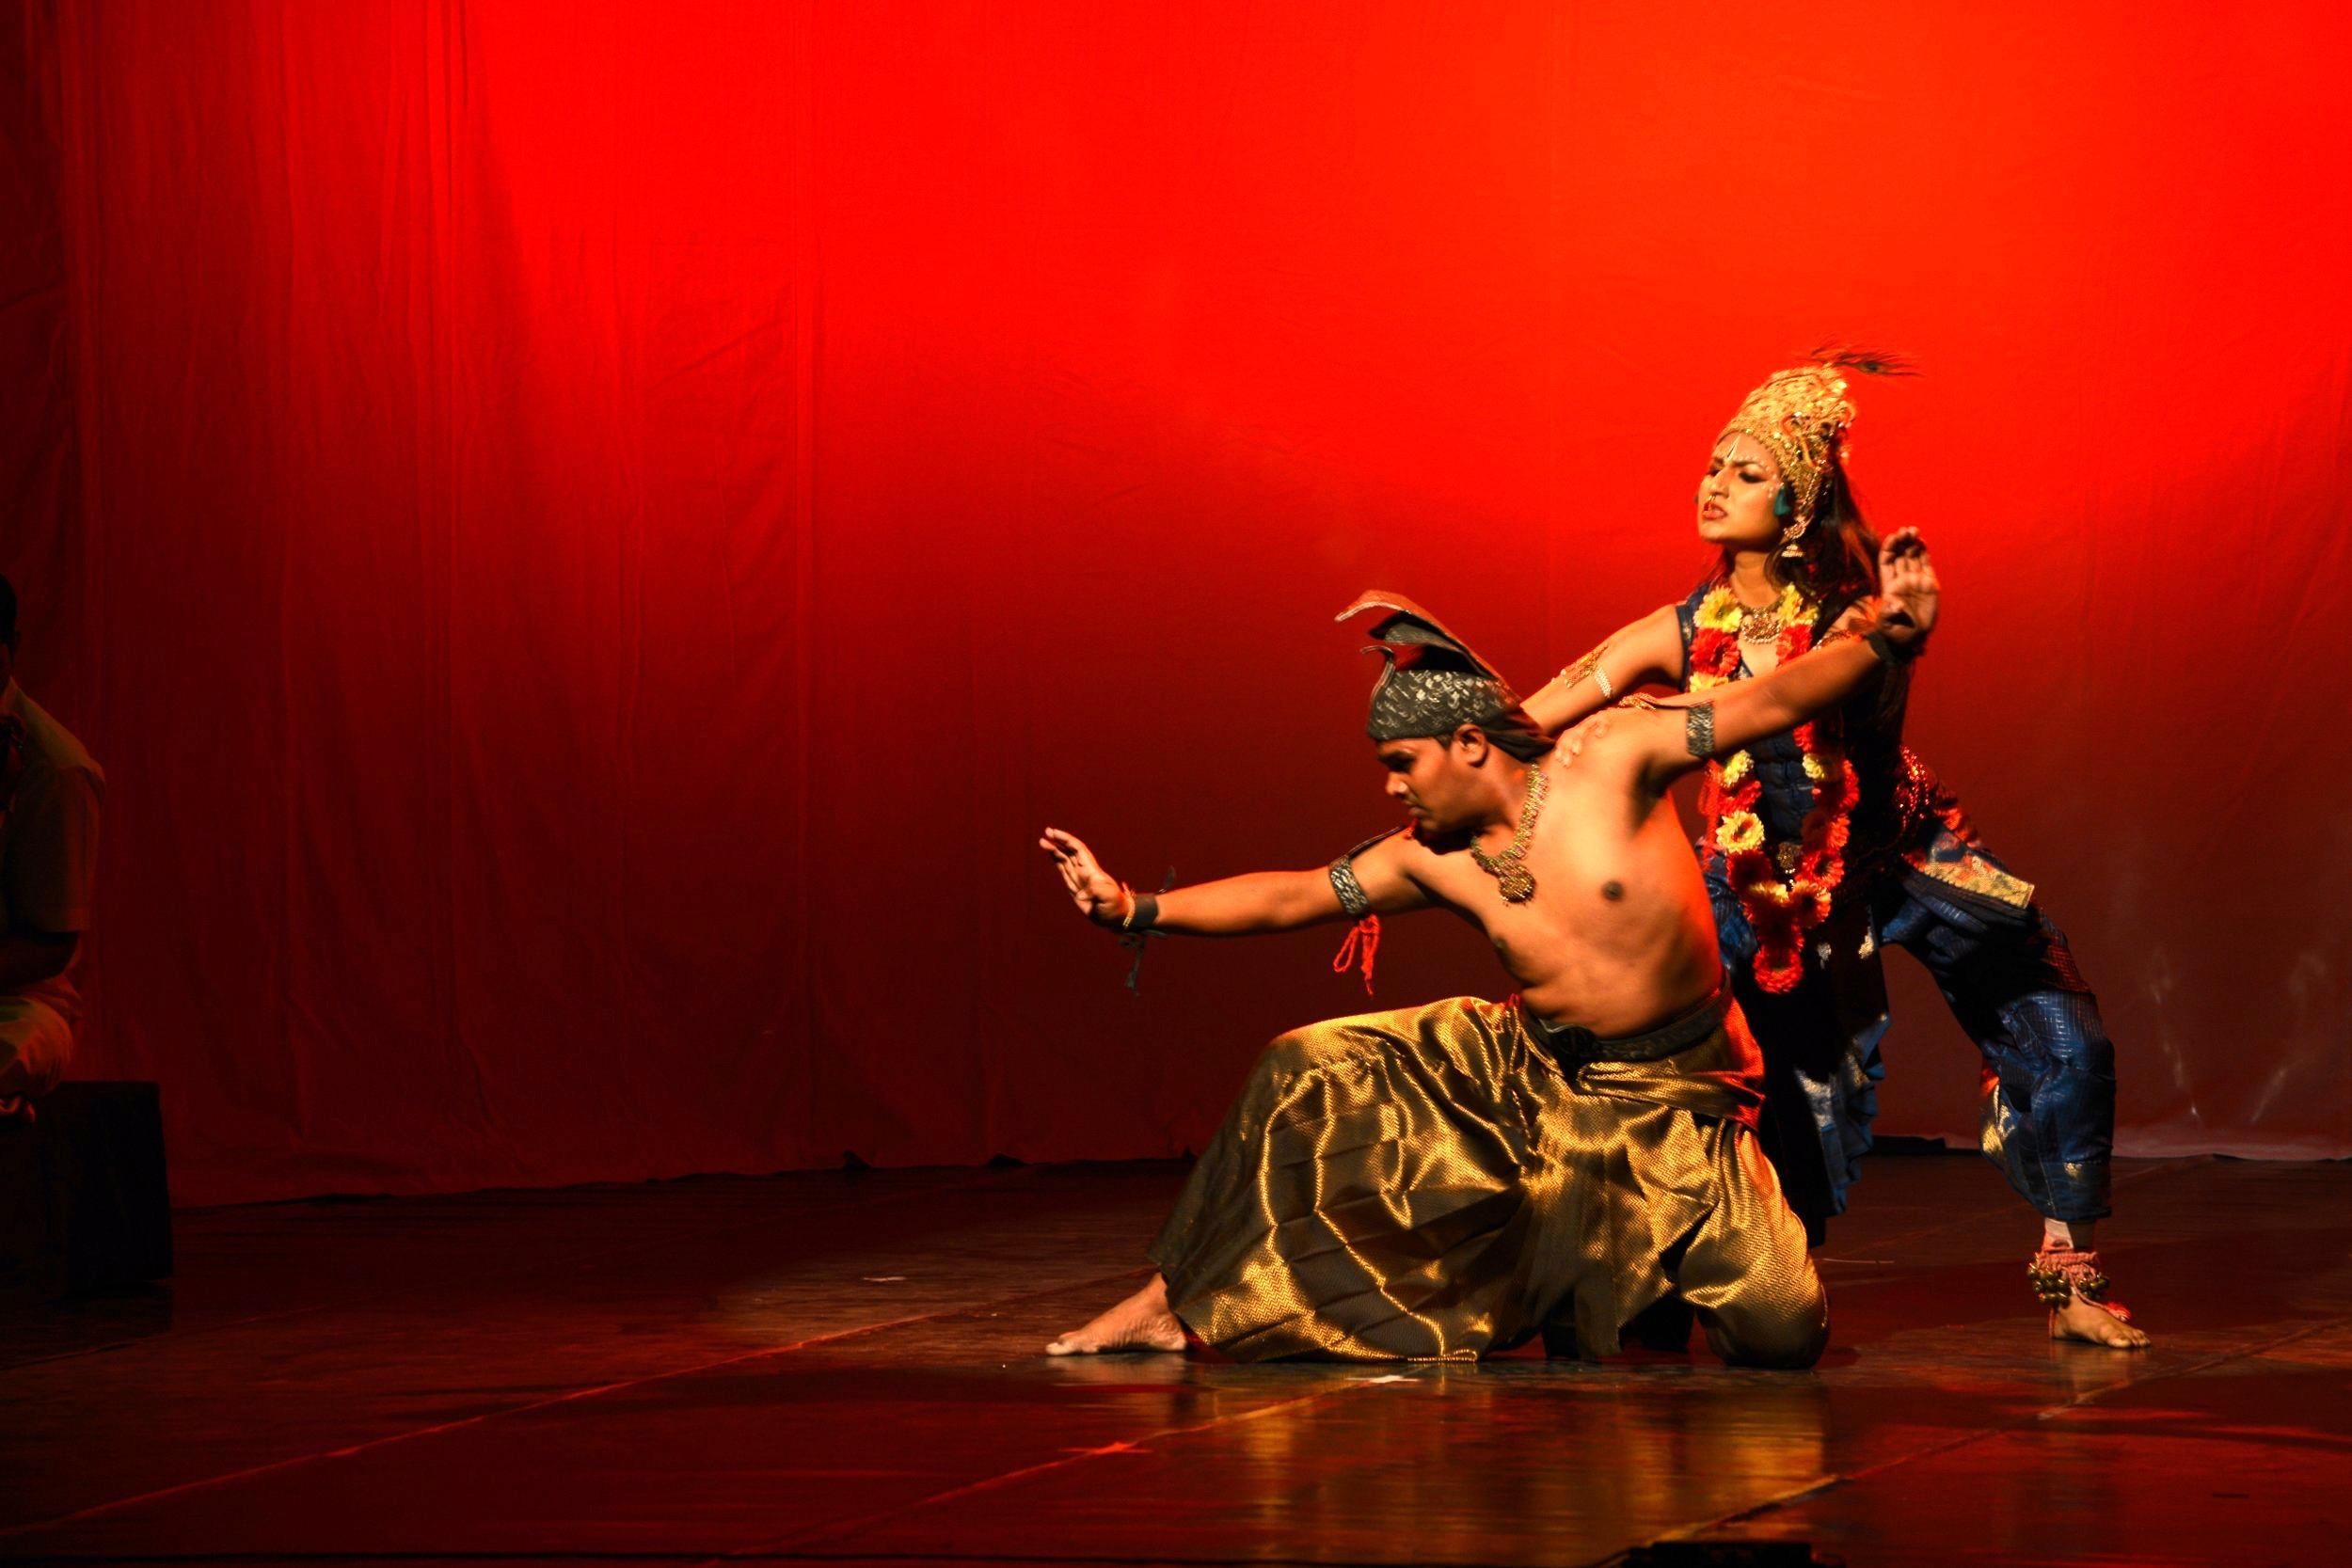 Lord Krishna fighting the vicious serpent Kaliyah